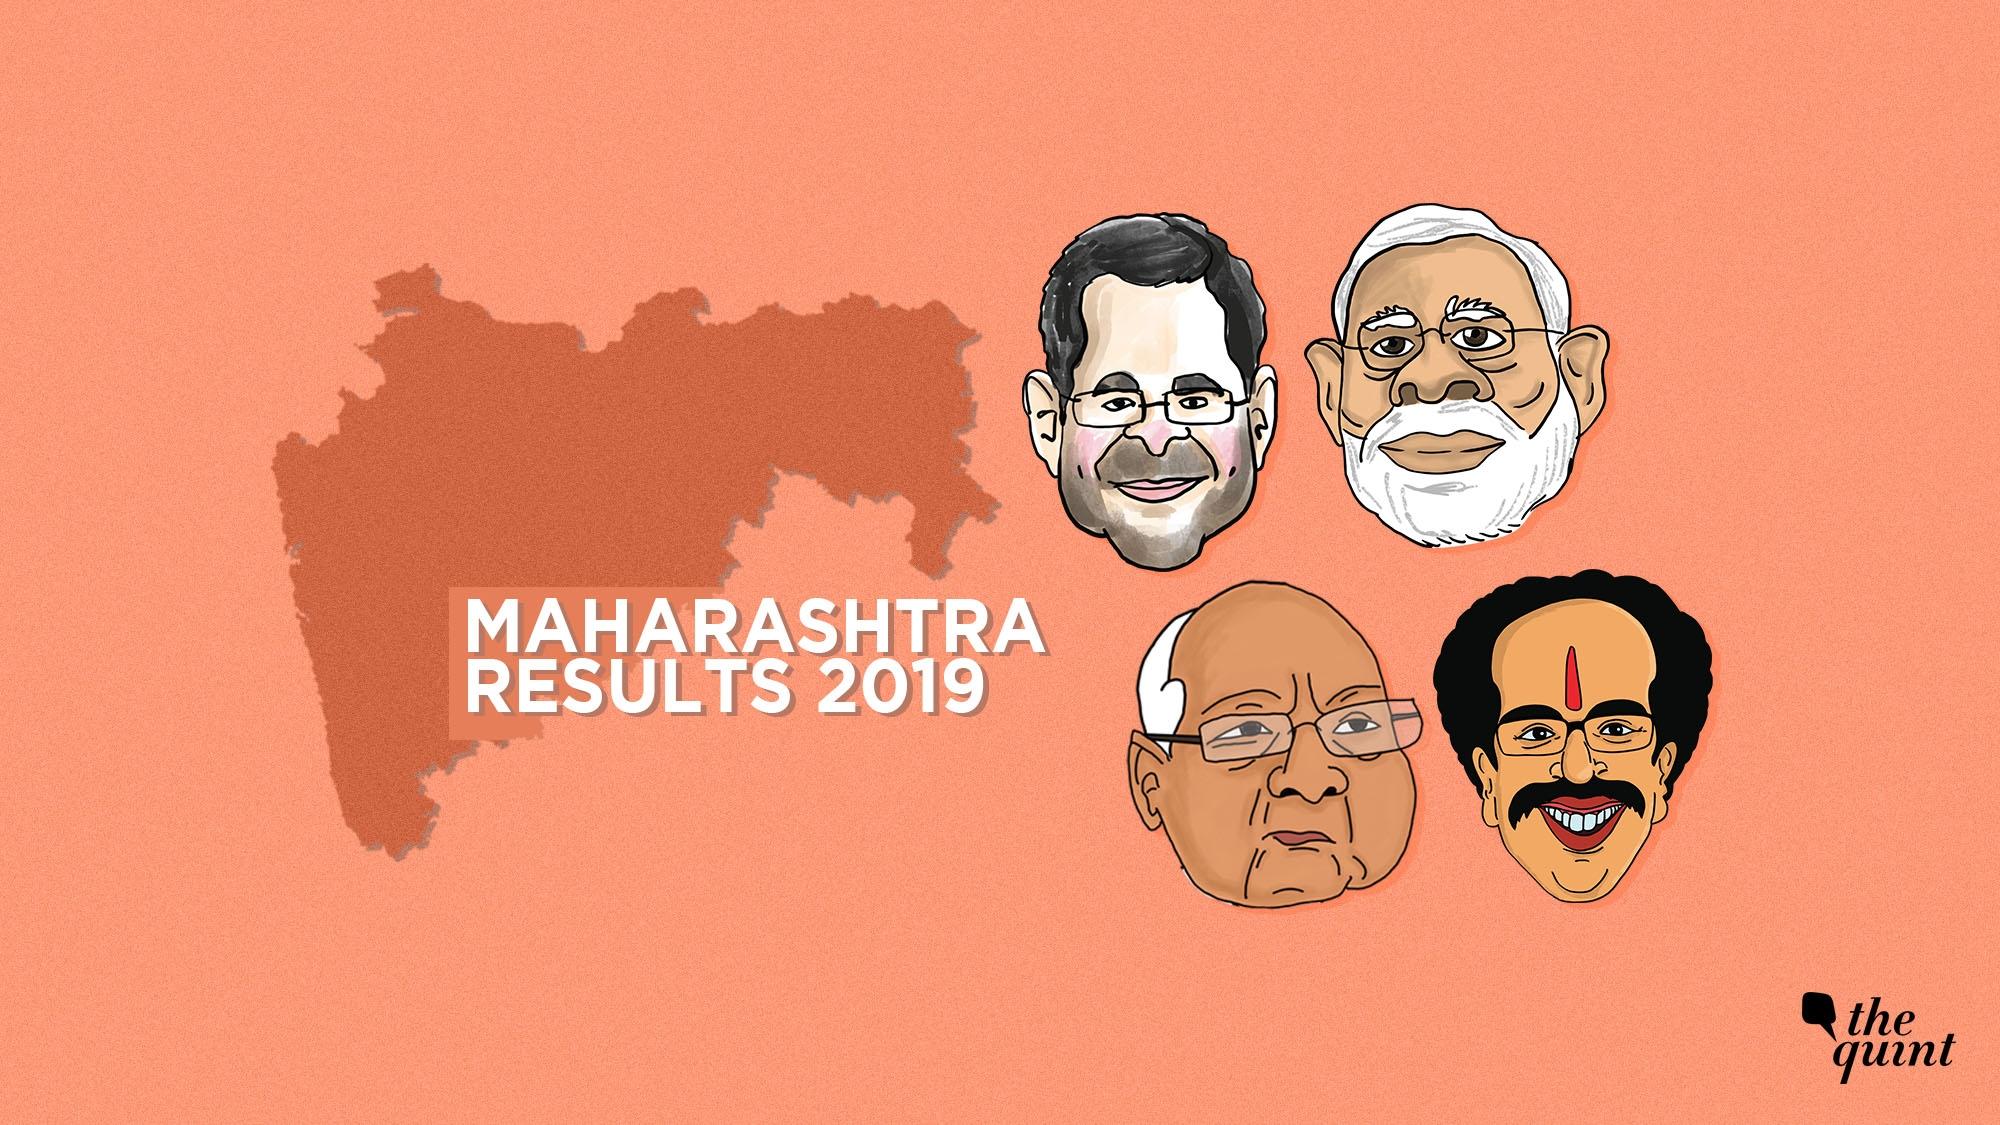 Maharashtra Polls: BJP+ Lead in 44 Seats, Gadkari Lead in Nagpur